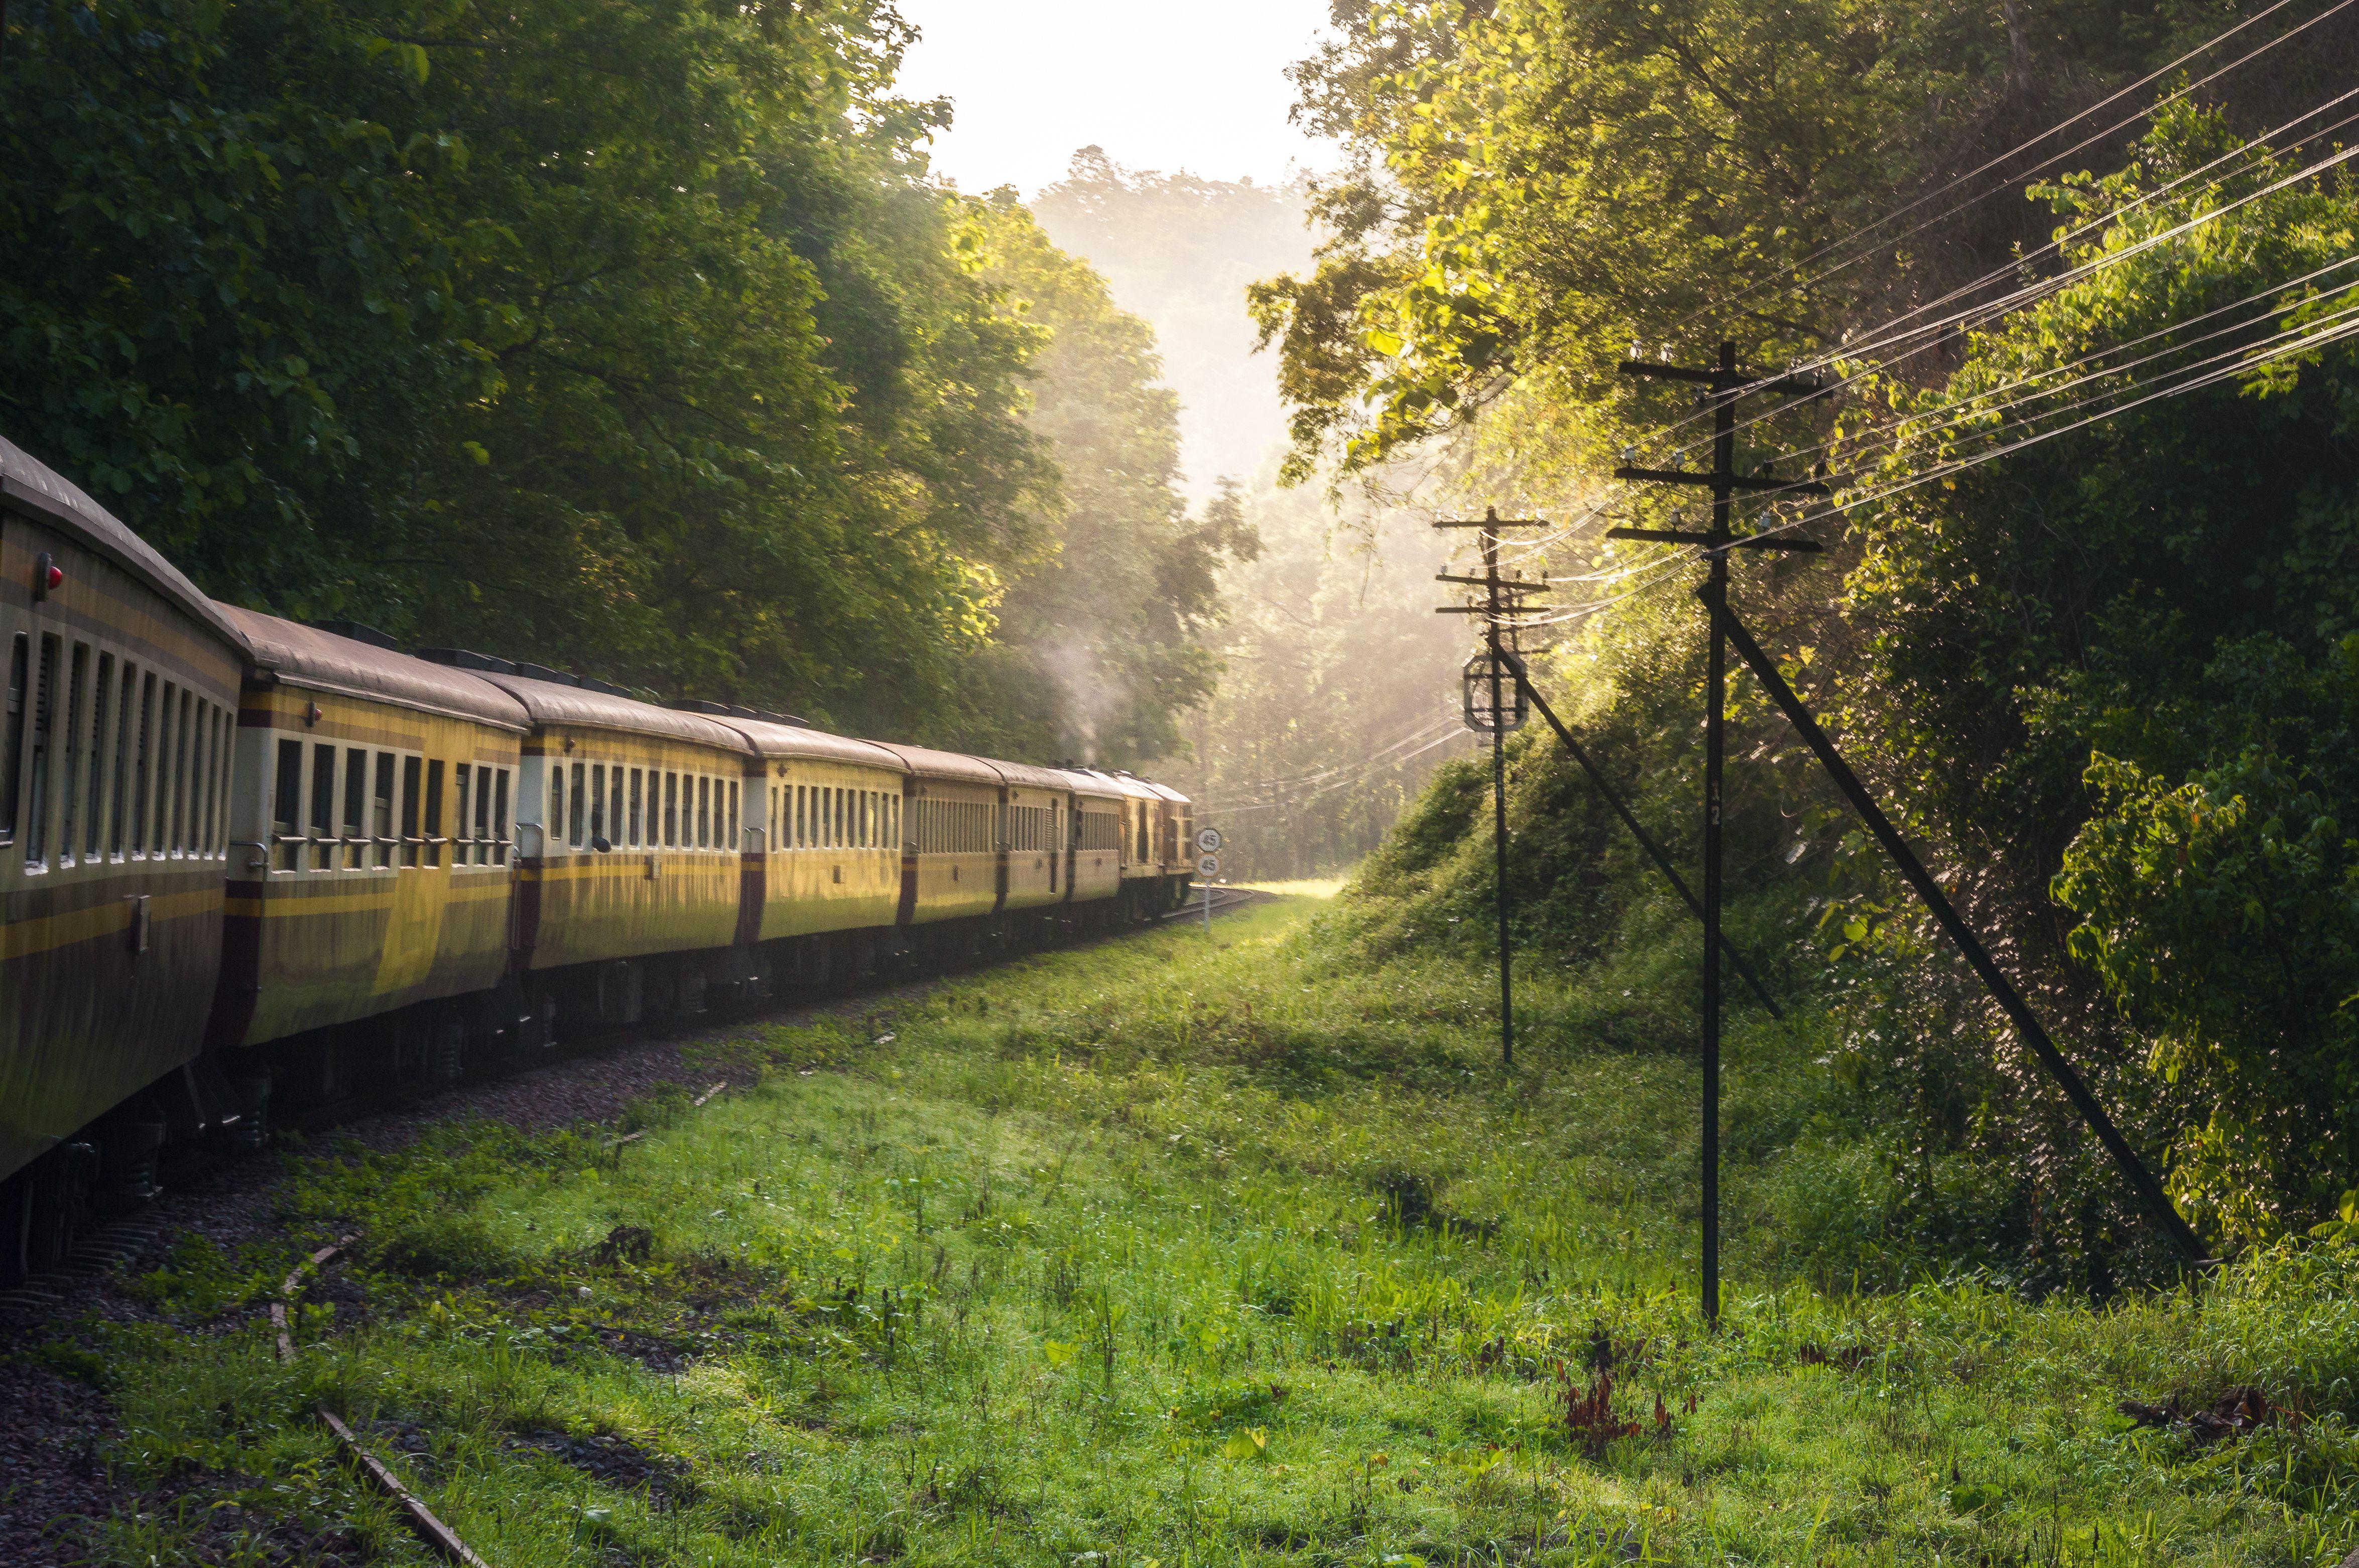 Chiang Mai To Bangkok Train Travel Time